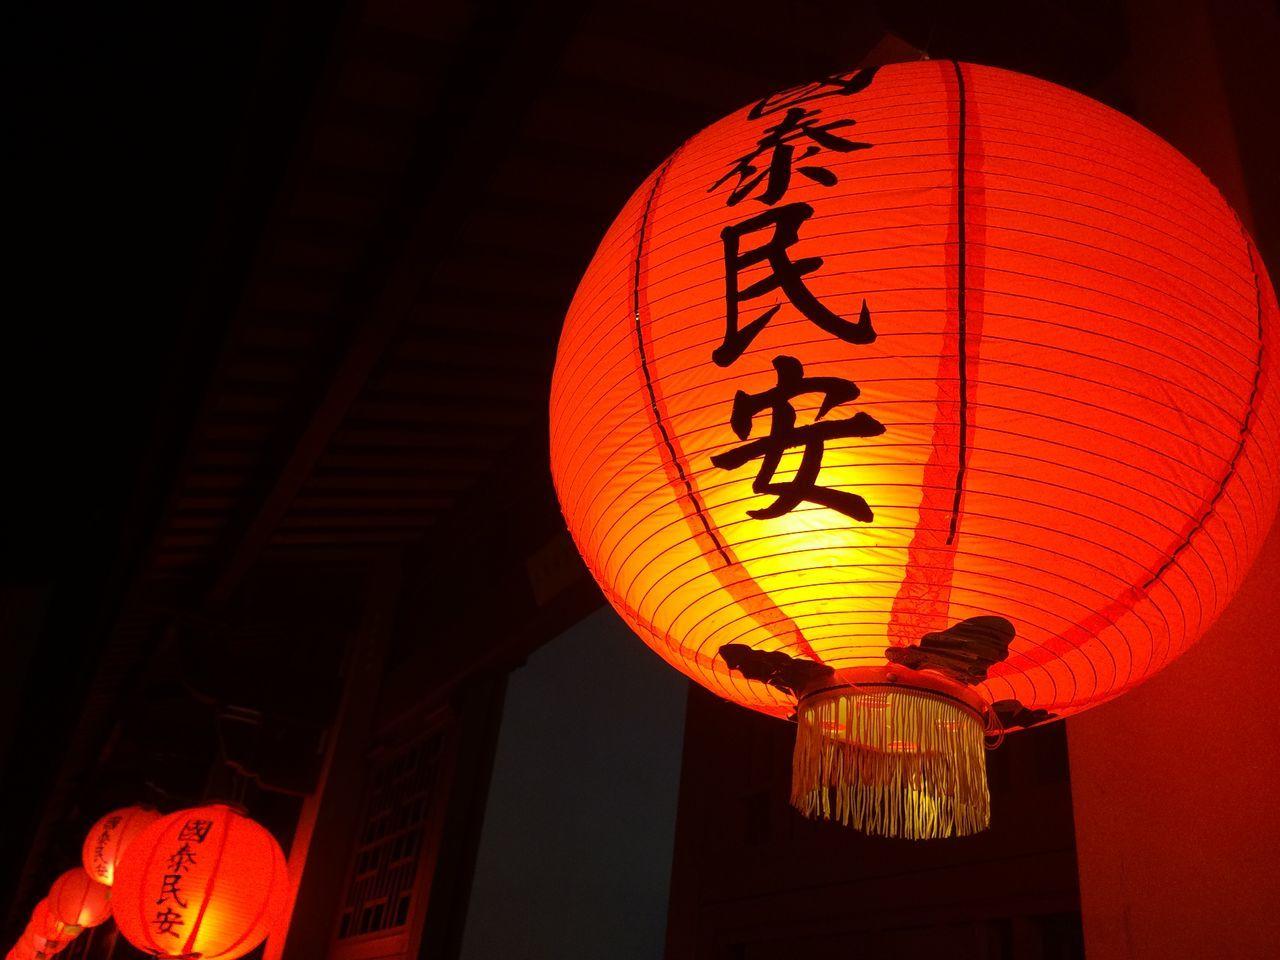 國泰民安,平安喜樂。 Chinese Lantern Country Kinmen Tourism Lanterns Nightphotography Peace Taiwan View